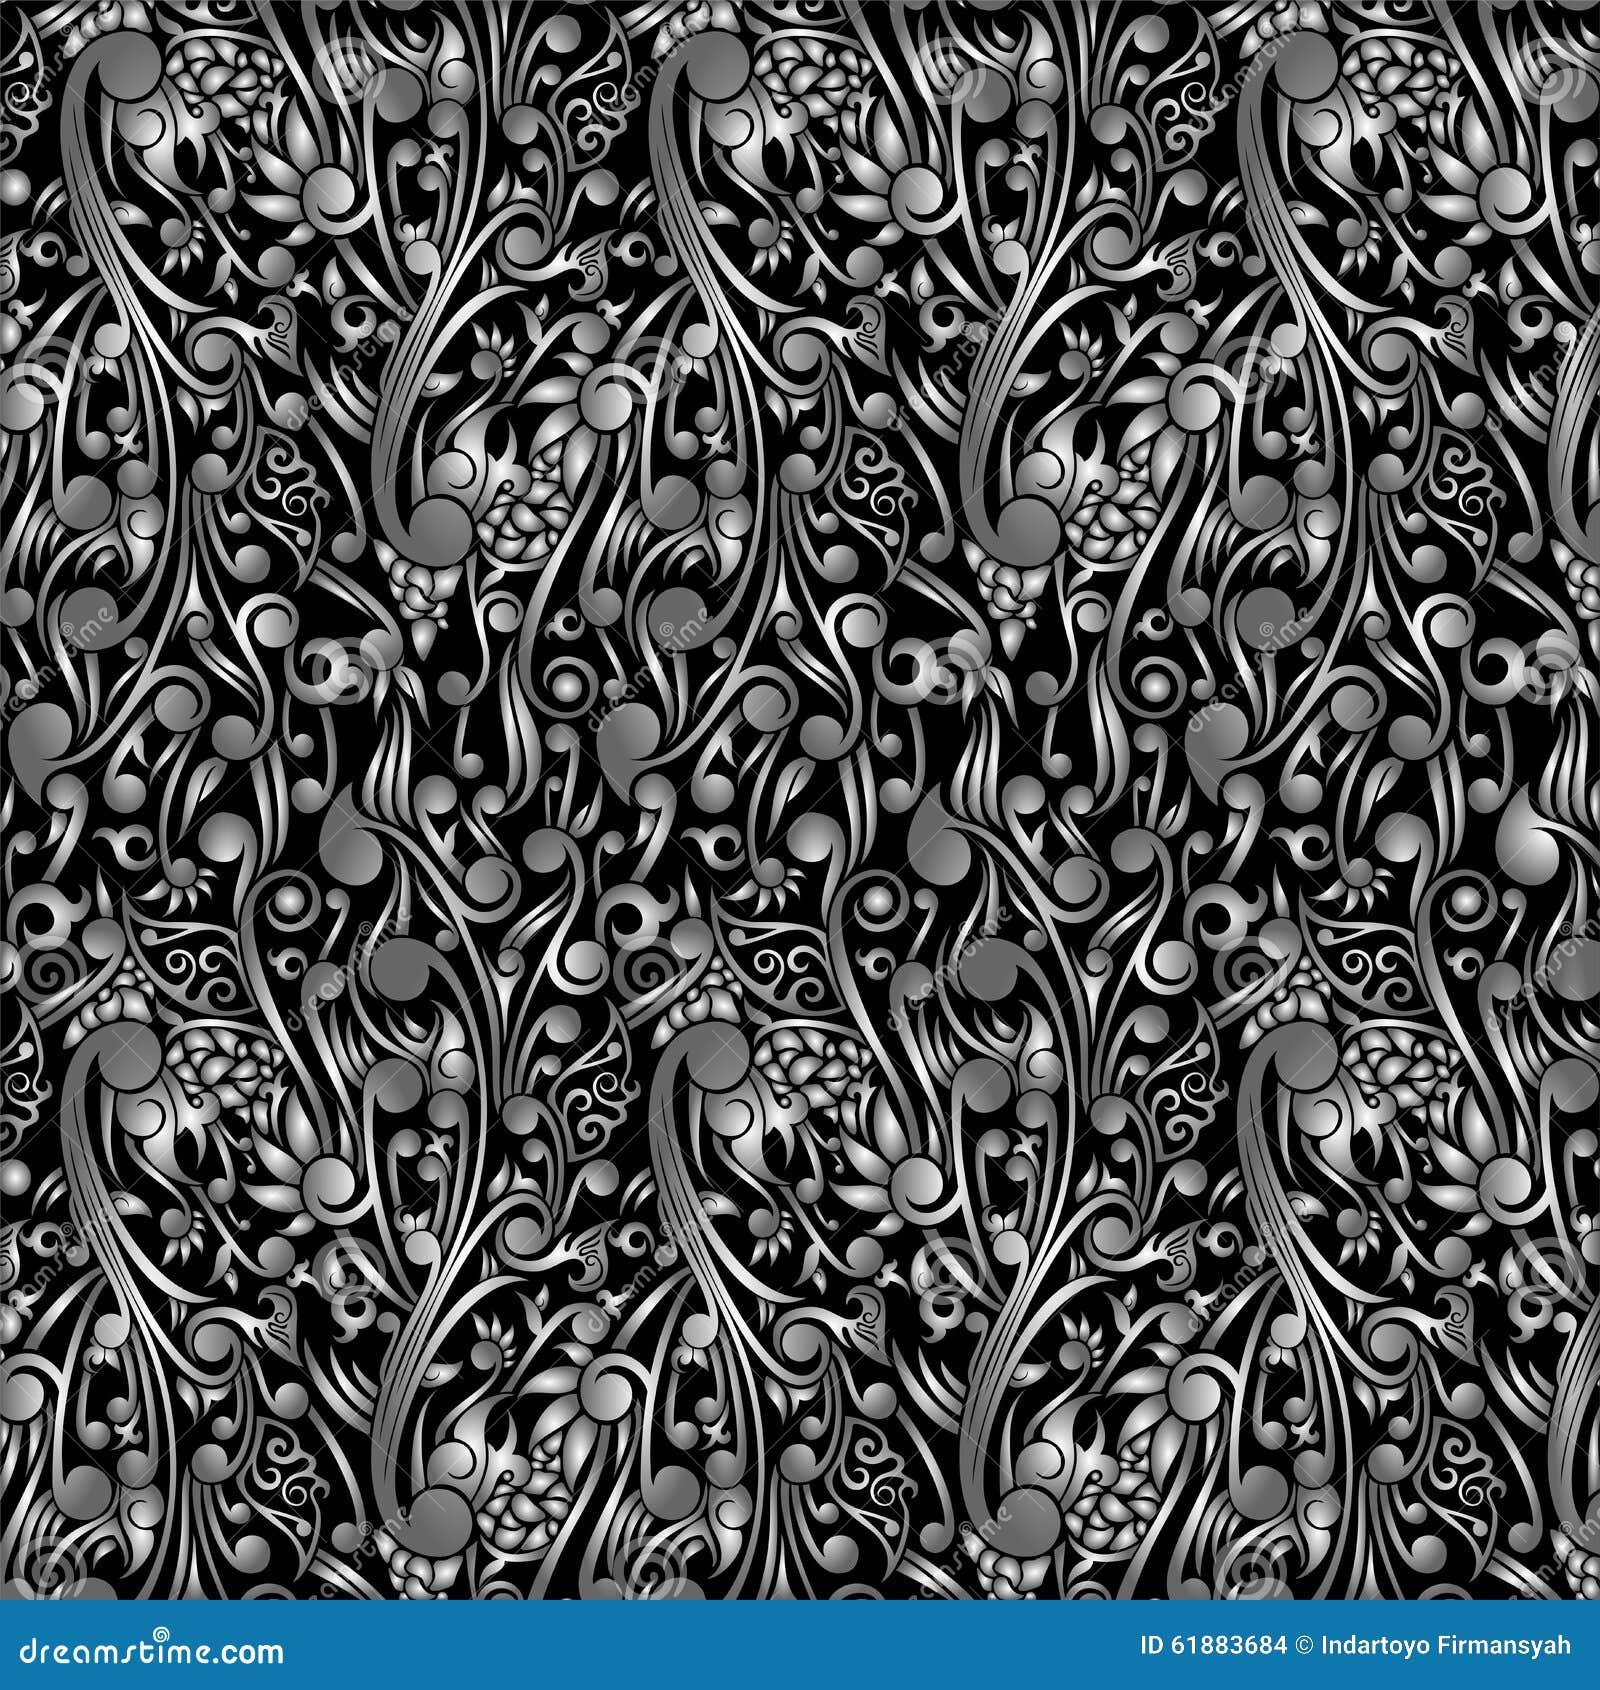 Wallpaper Batik Floral With Black Swirl Shape Stock